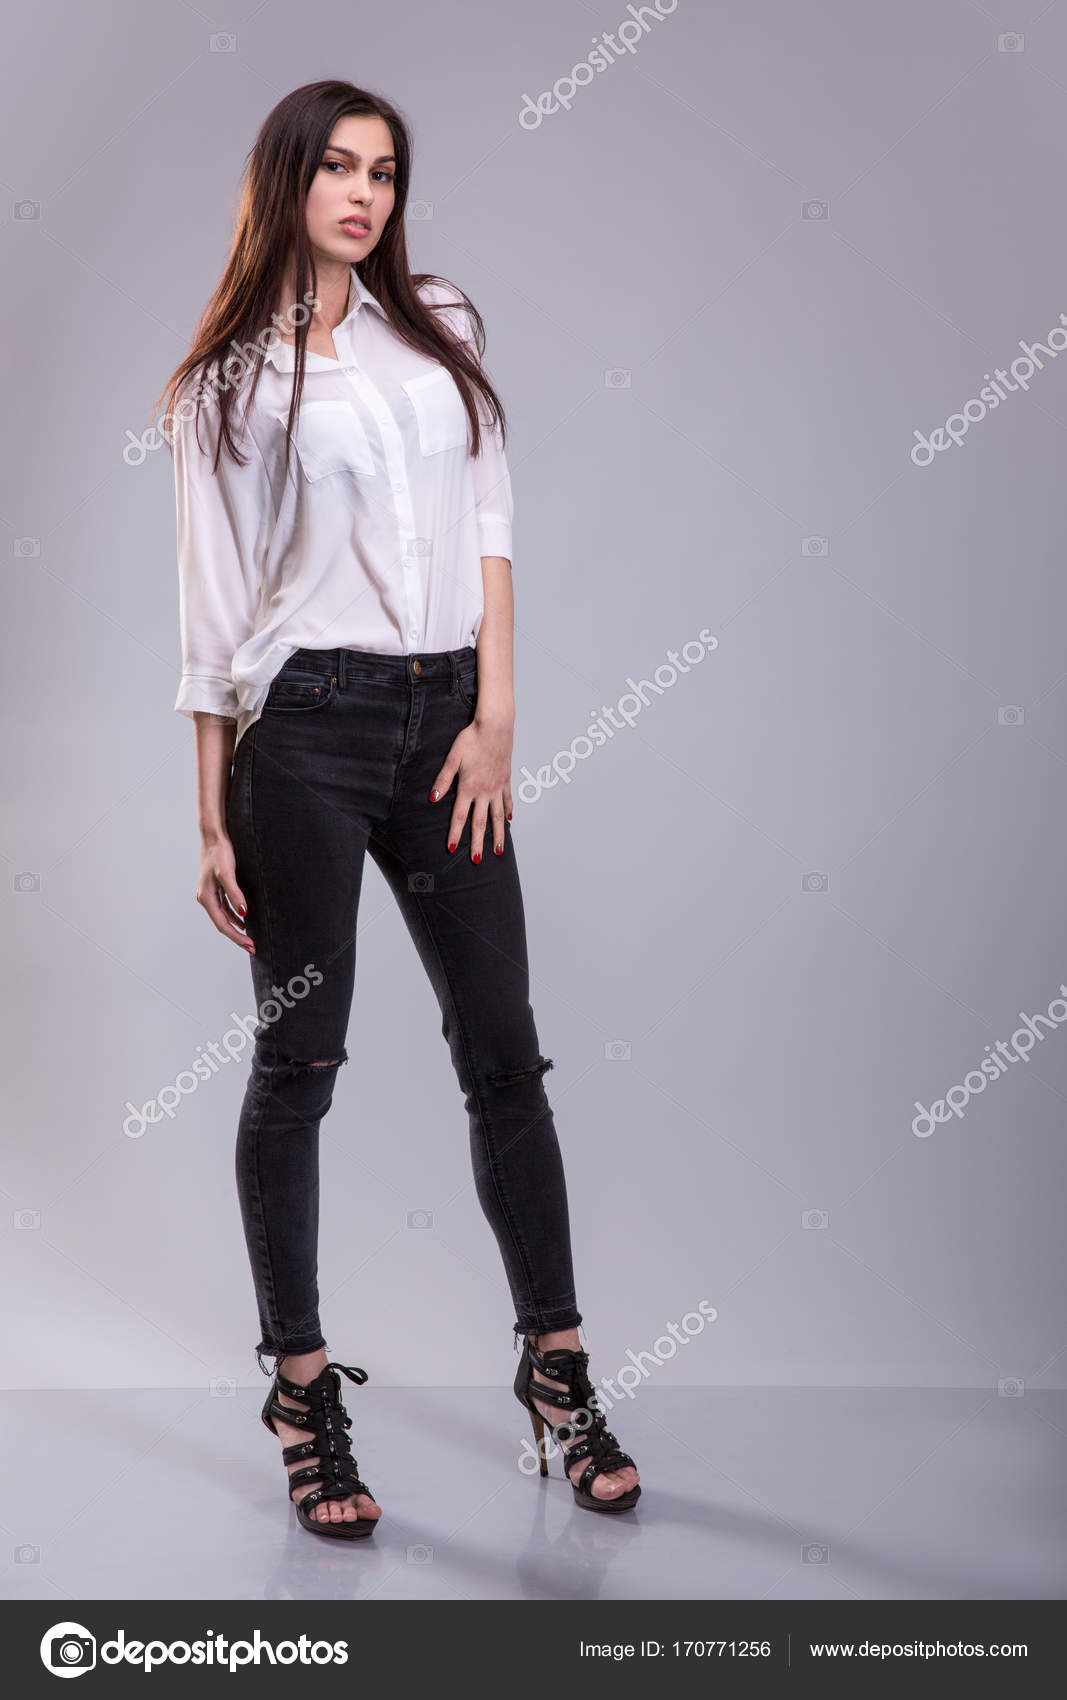 c6b40dbb946 Όμορφη σέξι νέους επαγγελματίες τρίχας Μελαχροινή γυναίκα φοράει λευκή  φούστα και το μαύρο παντελόνι ψηλά τακούνια παπούτσια ρούχα επιχειρήσεων  για ...